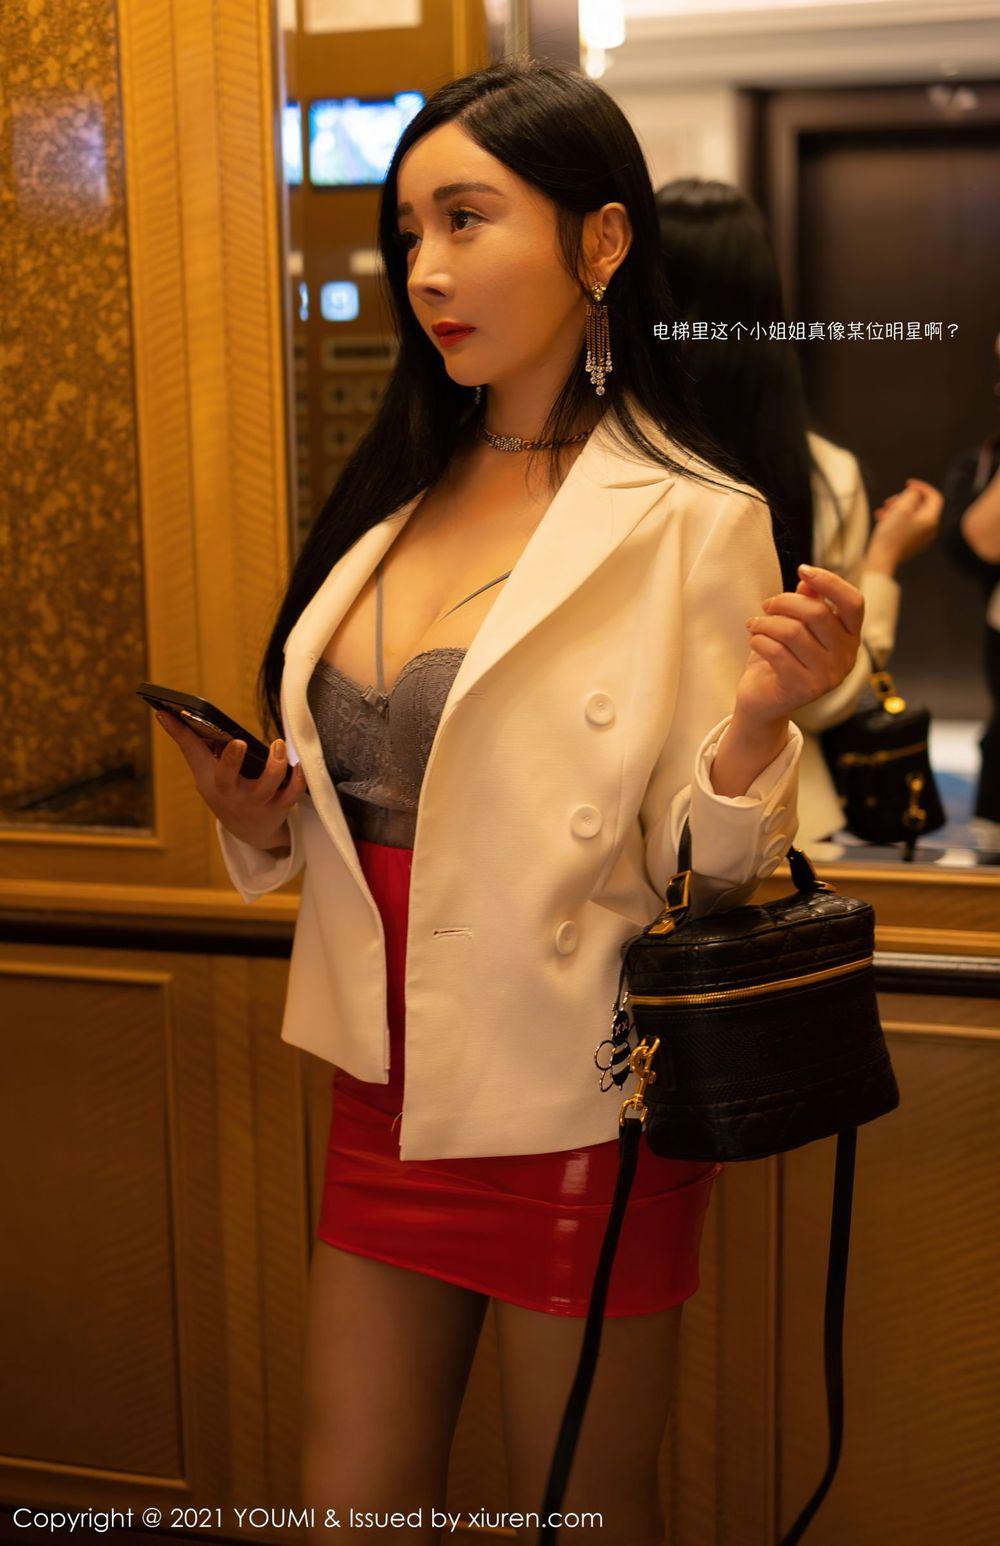 Vol.241 皮裙美女都市丽人SM捆绑翘臀美女模特尤蜜荟-允爾完整私房照合集